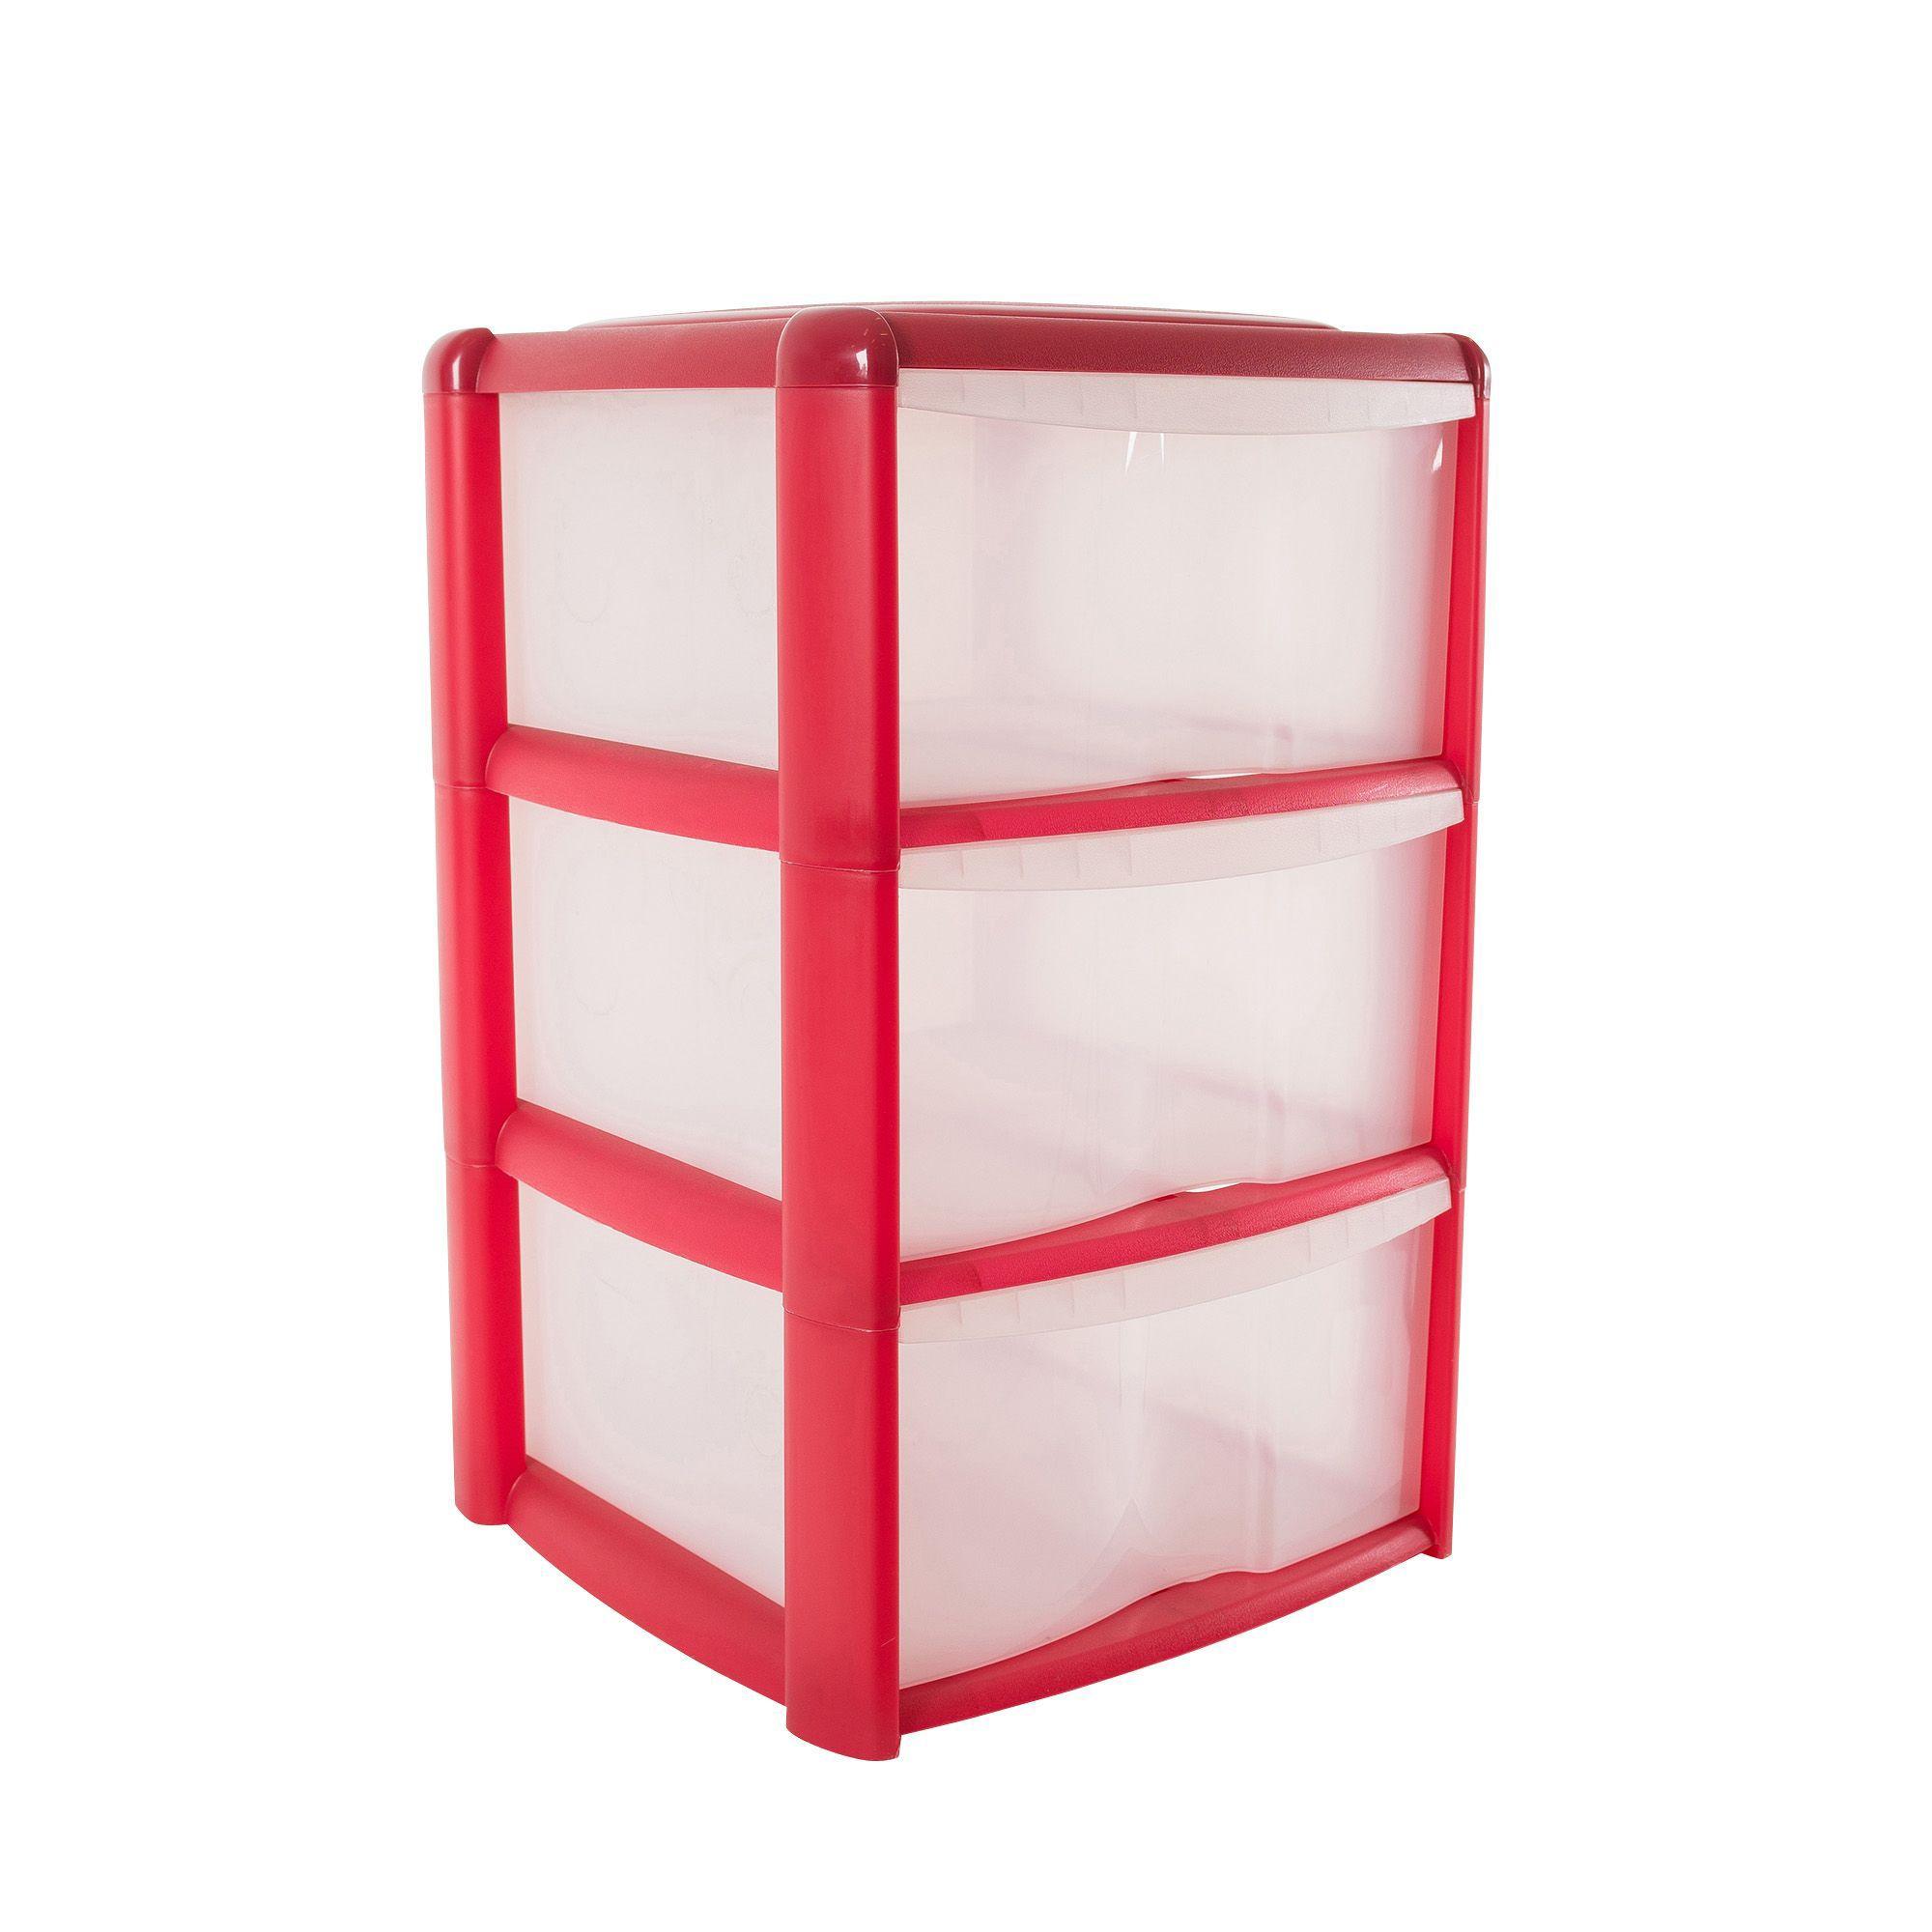 B&q Red Plastic Tower Unit